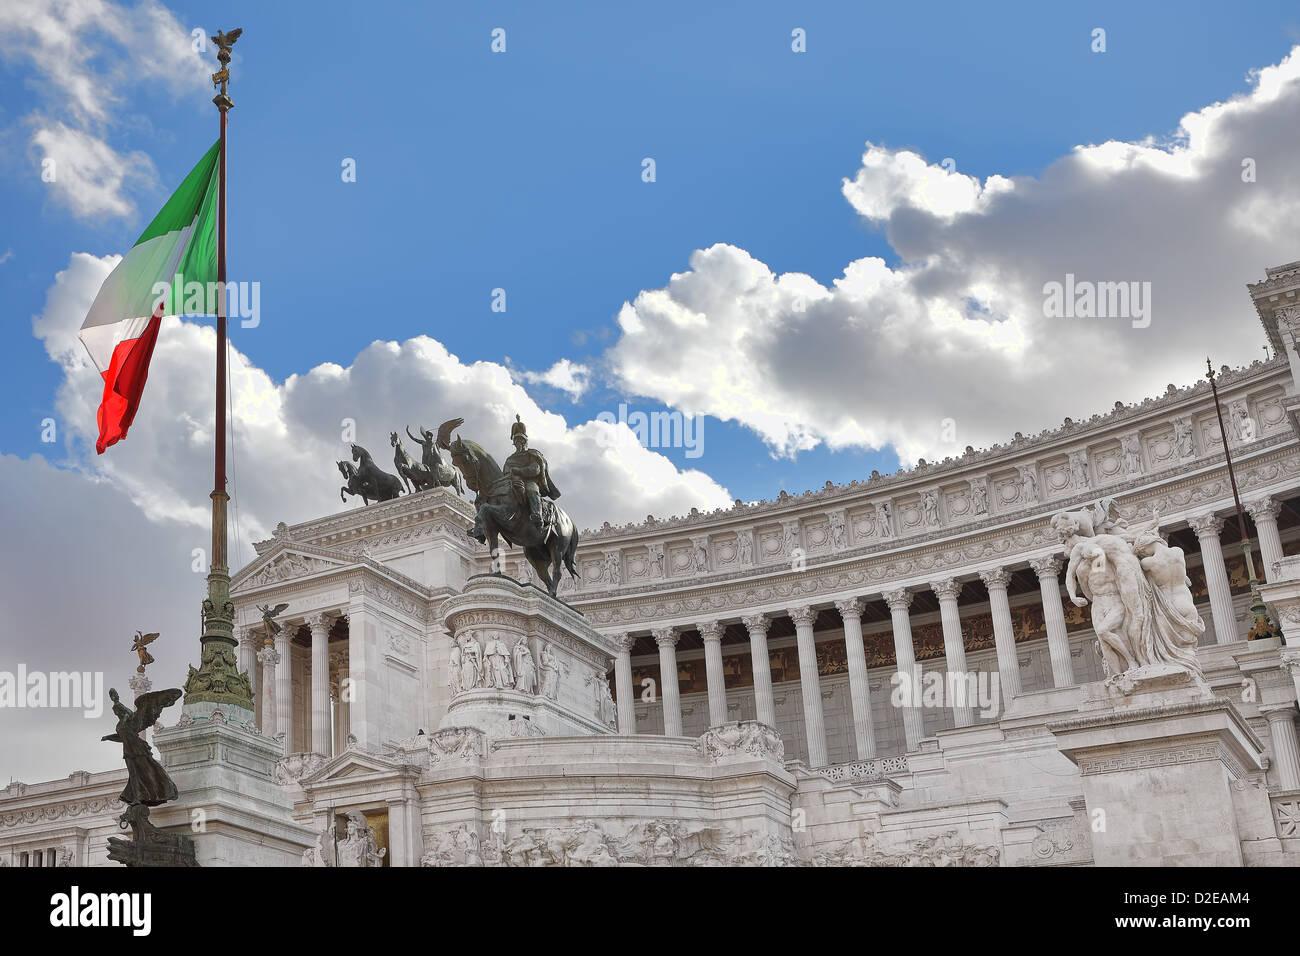 Famous Victor Emmanuel II (Vittorio Emanuele II) monument aka Altar of the Fatherland with italian national flag - Stock Image